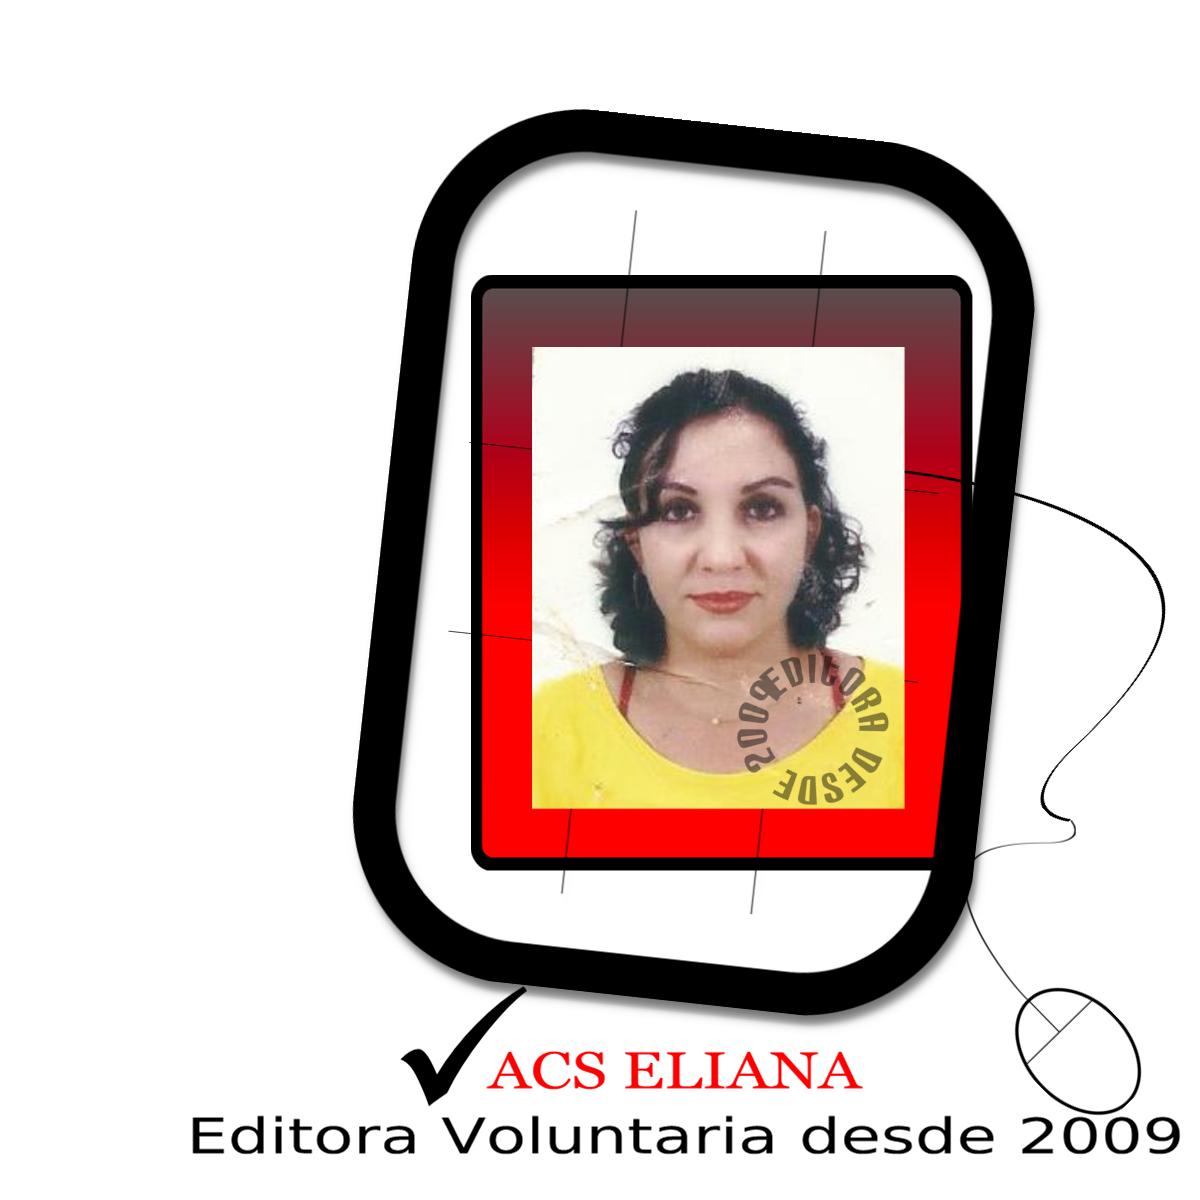 Editora Voluntária deste Site